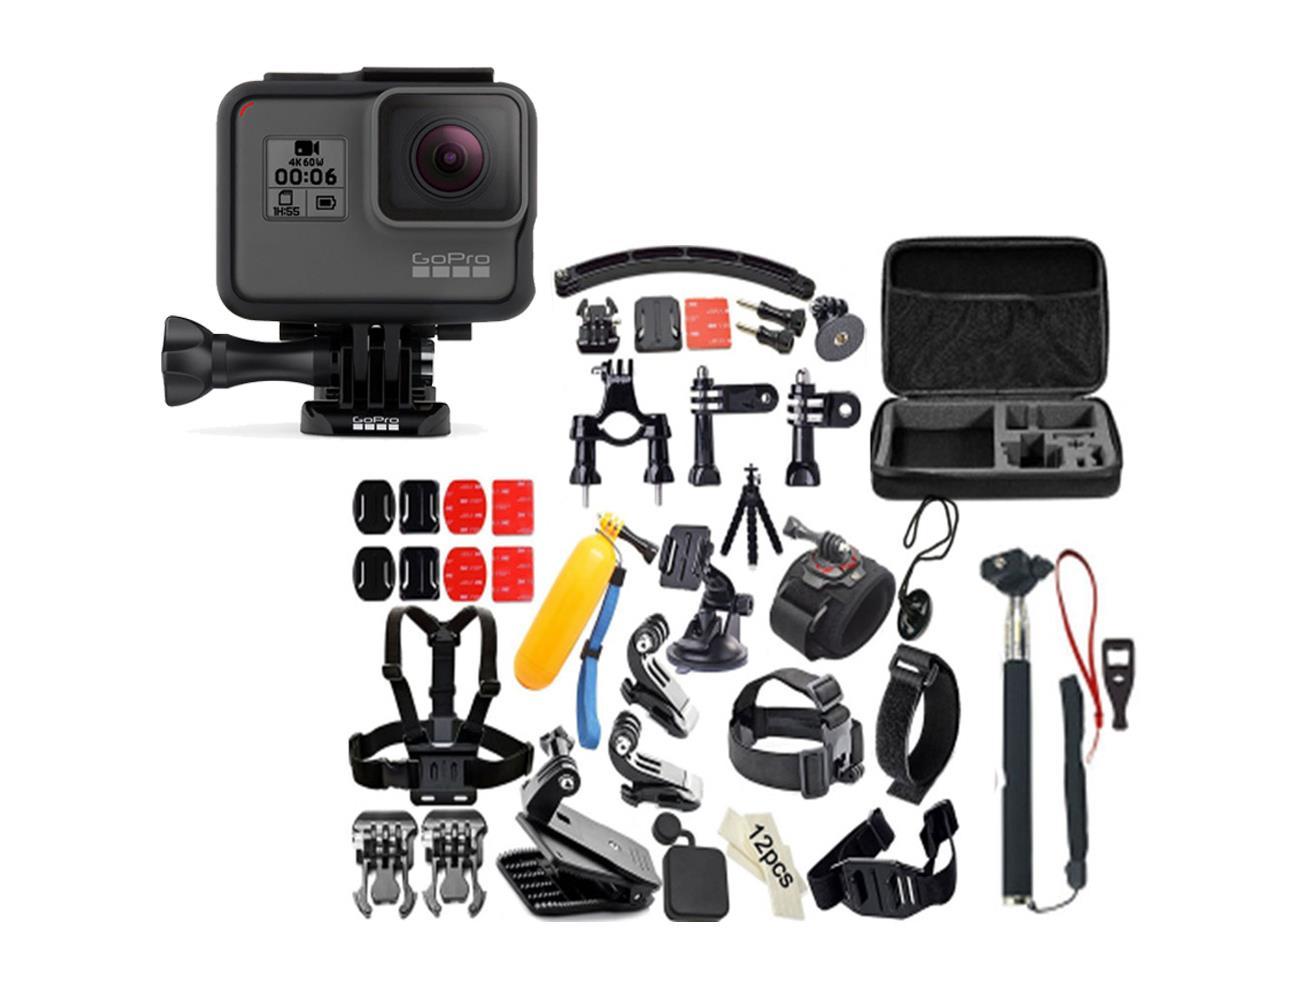 gopro hero 6 water proof 4k action camera with free kamkit gopro accessories kit blink kuwait. Black Bedroom Furniture Sets. Home Design Ideas